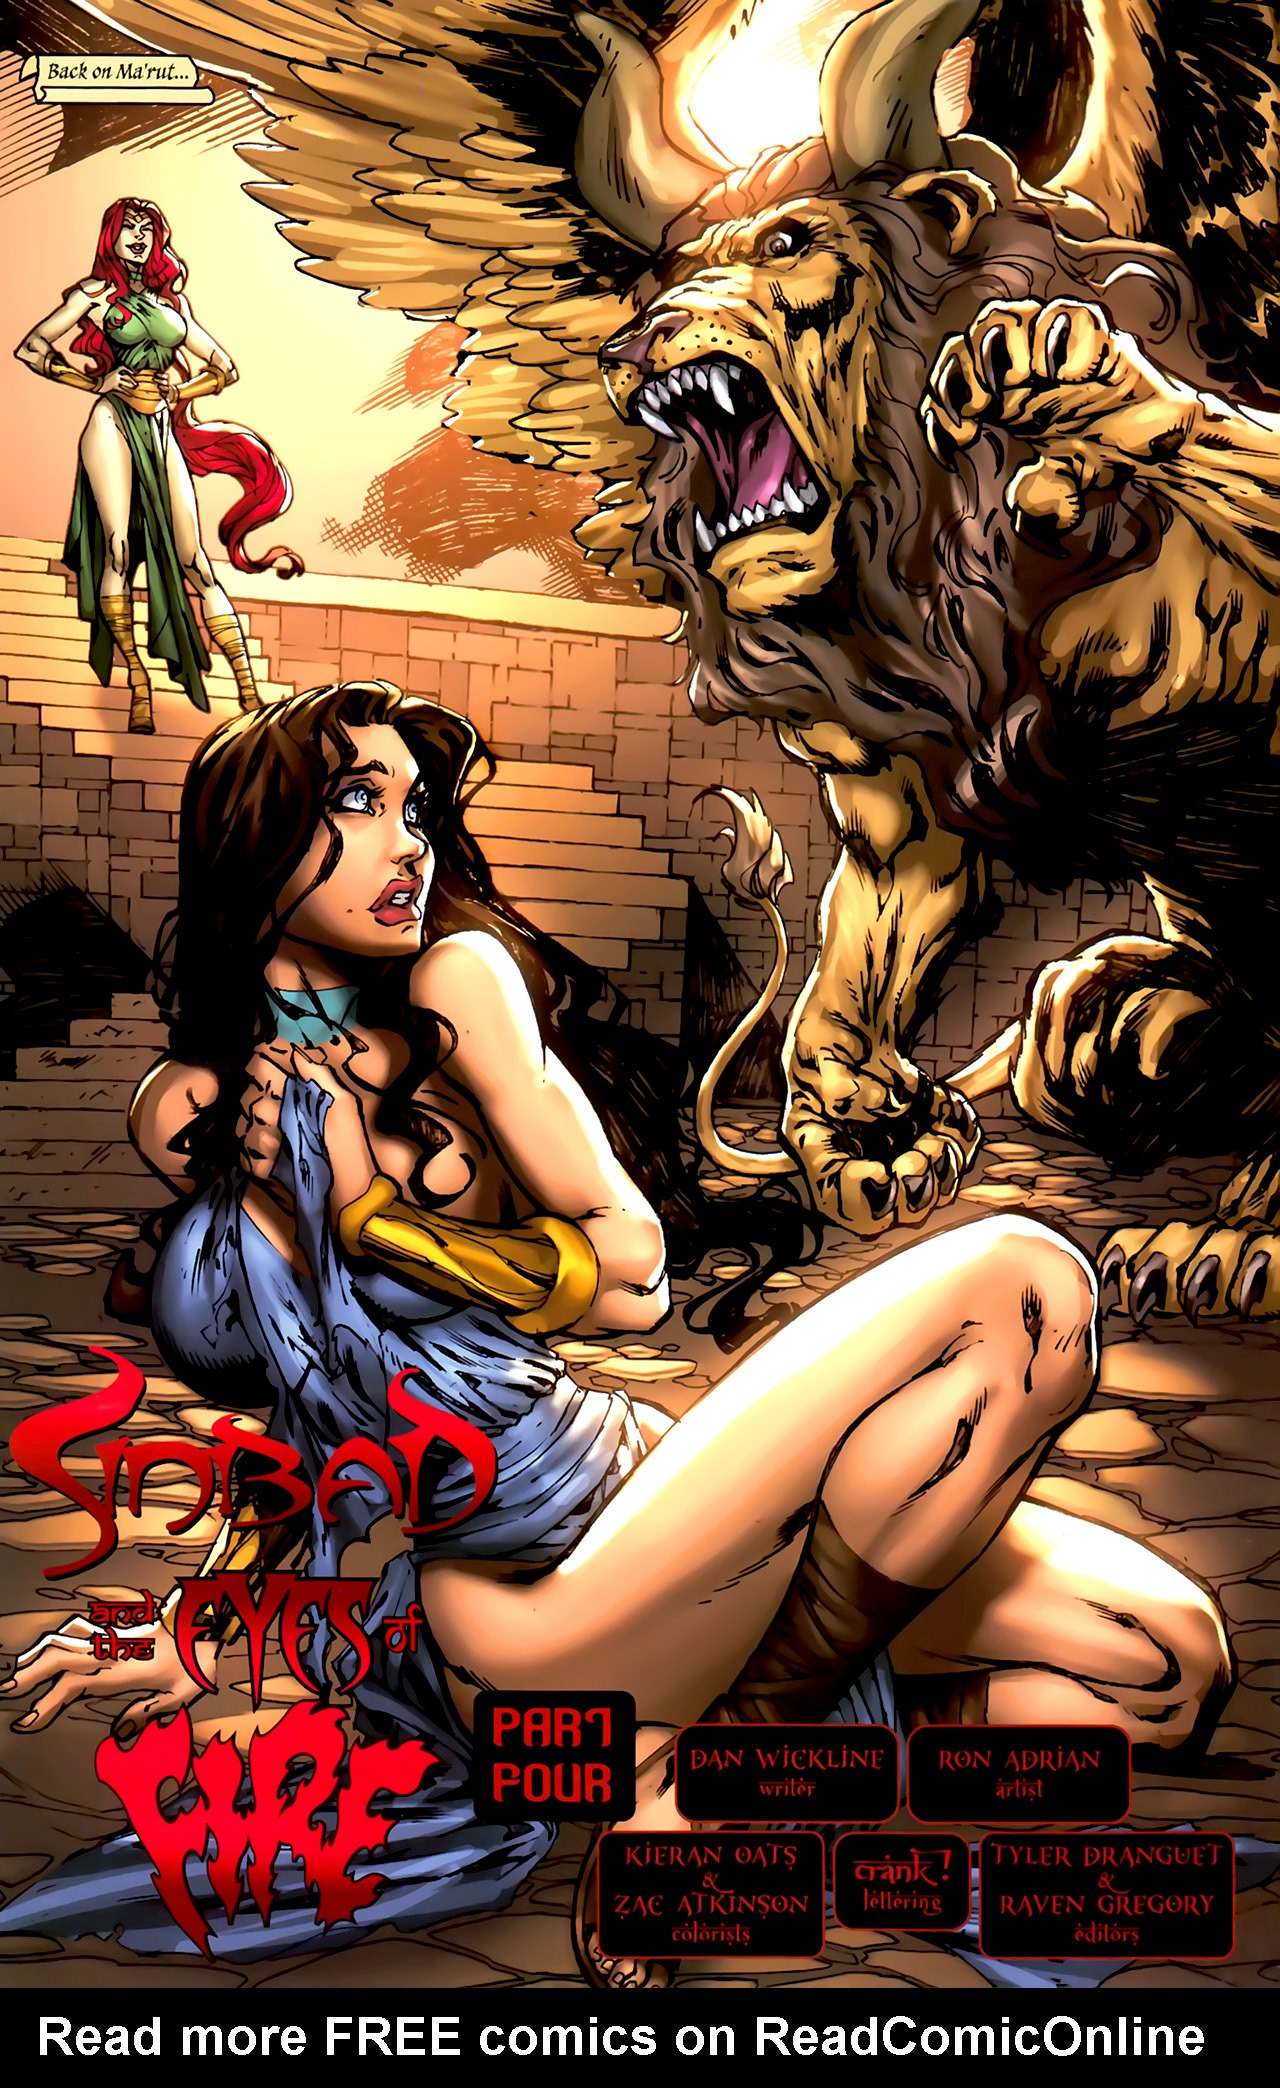 Read online 1001 Arabian Nights: The Adventures of Sinbad comic -  Issue #4 - 8